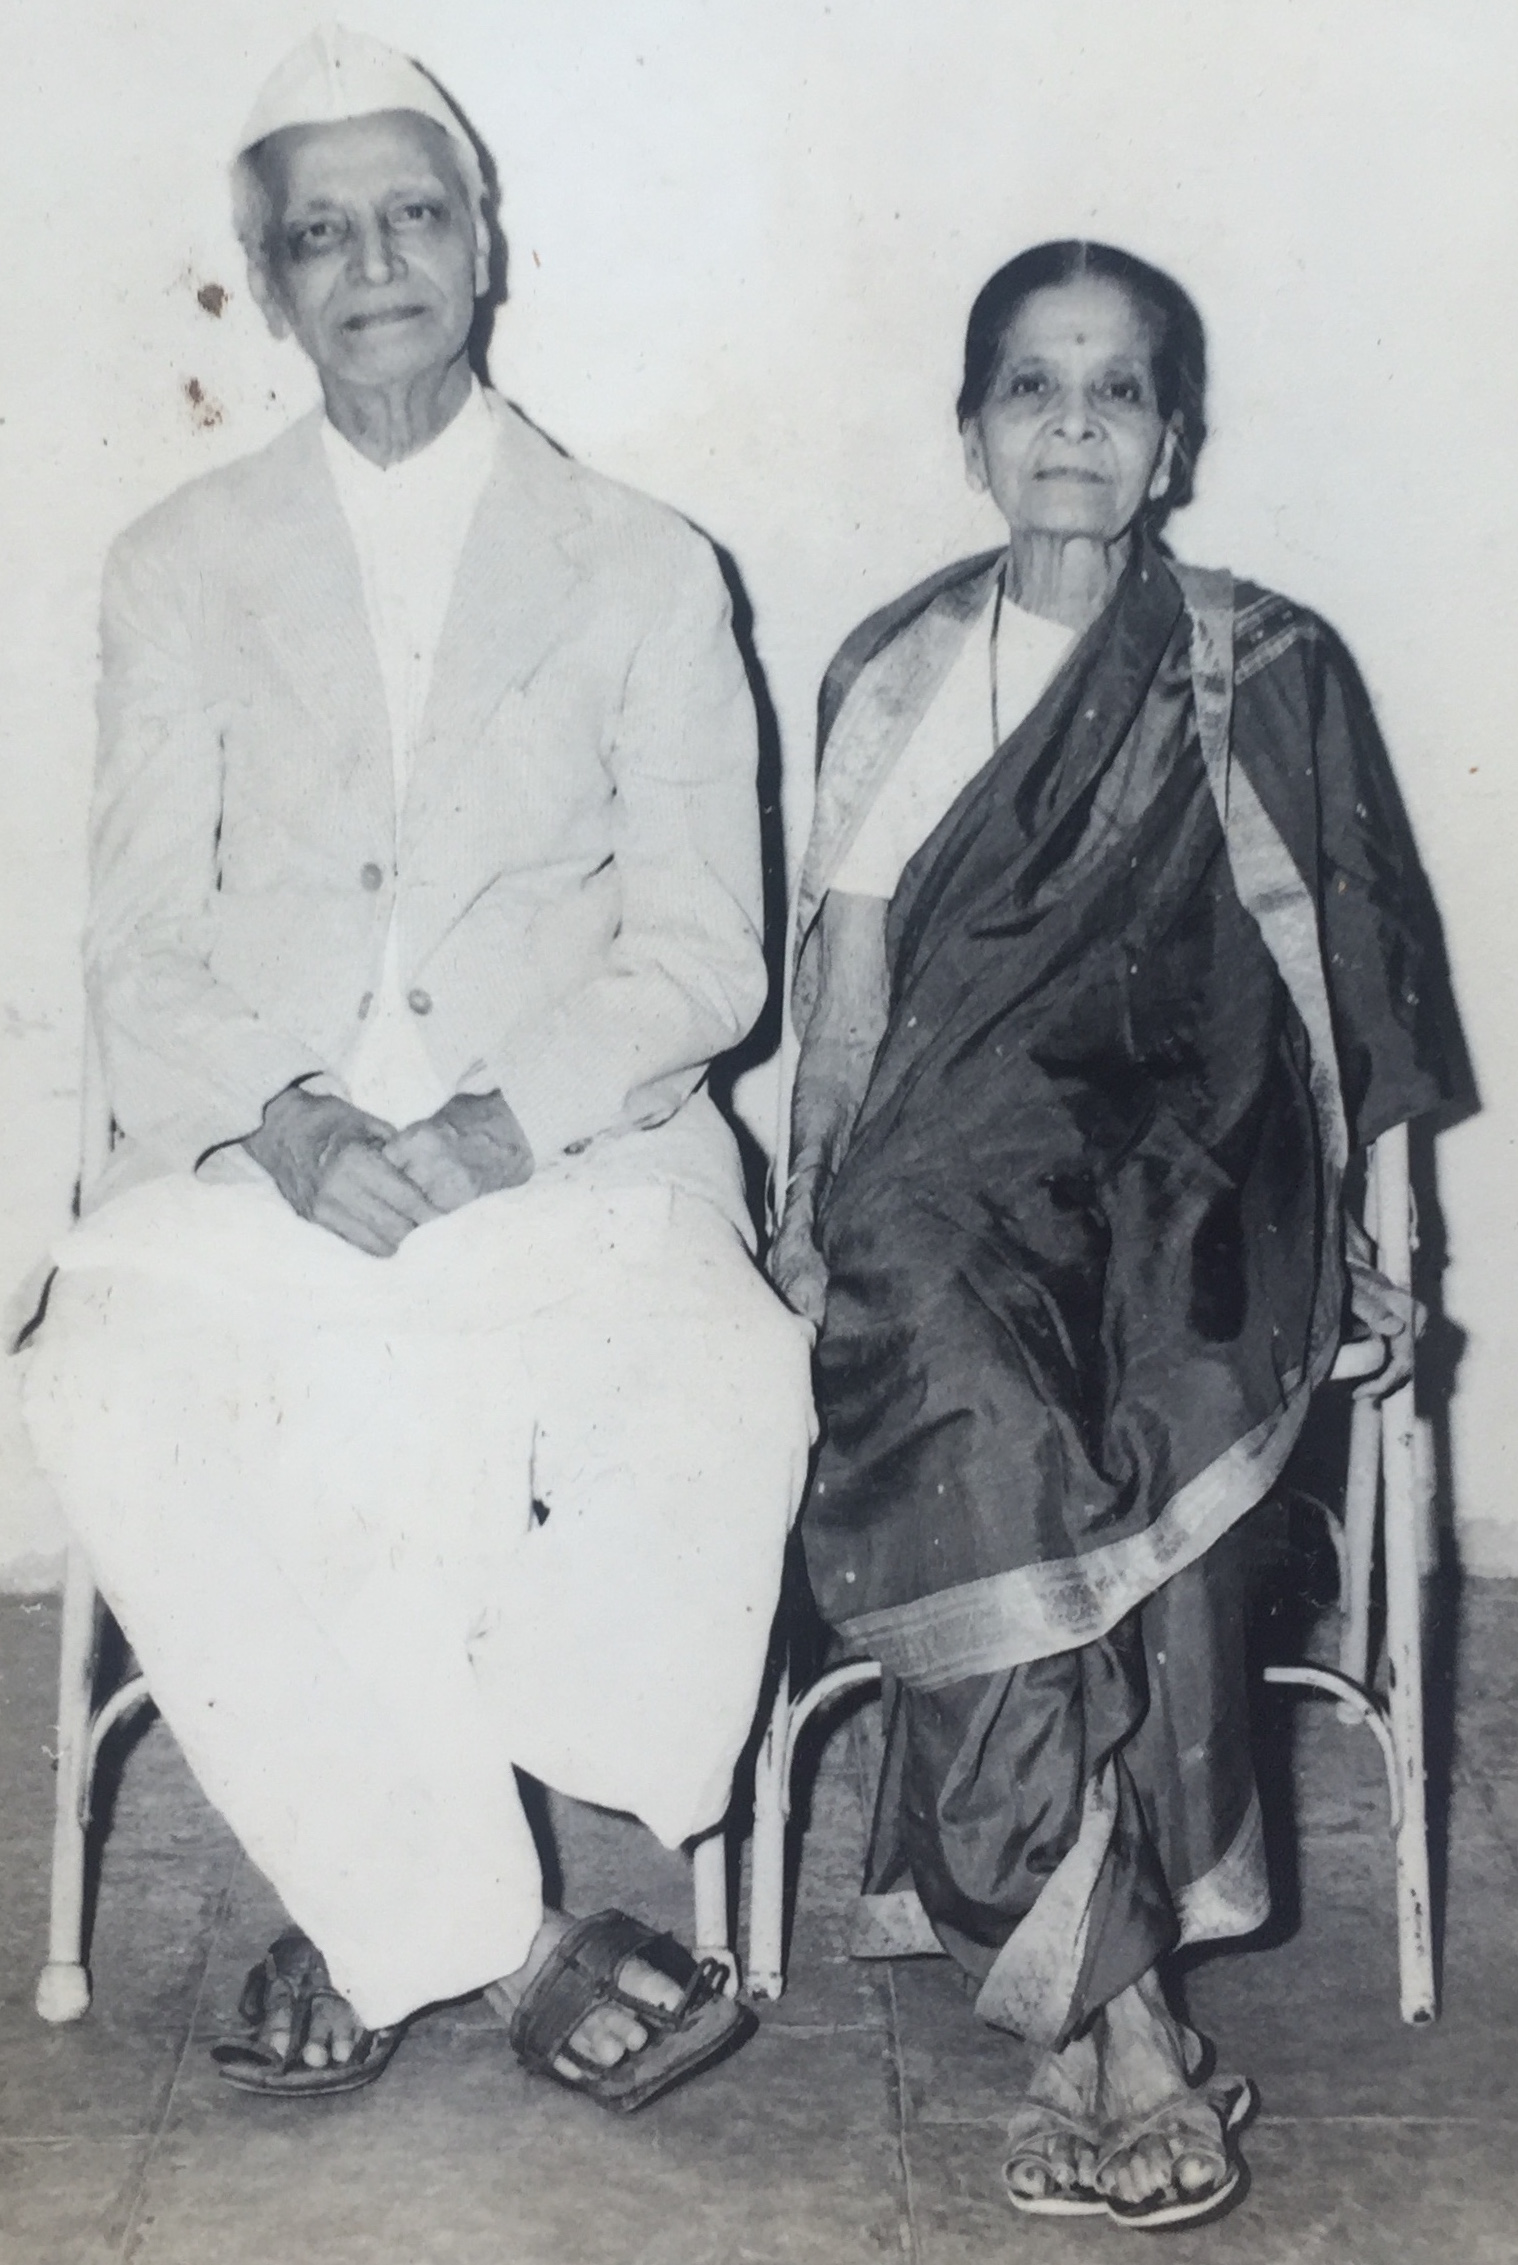 Vi Pra and Tarabai Limaye 1979